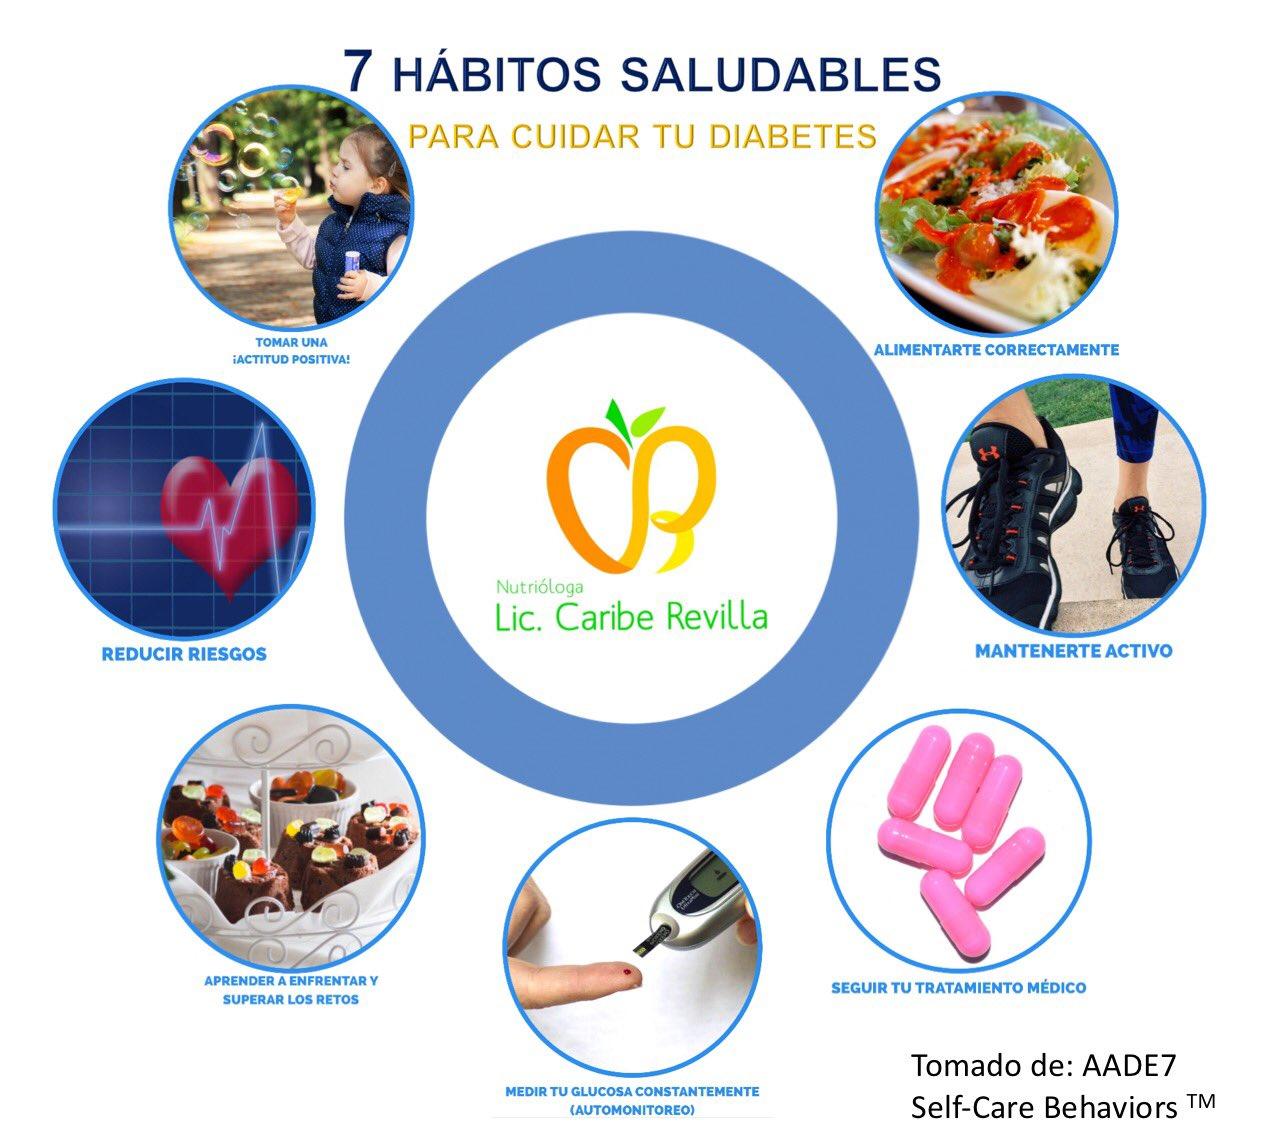 diabetes hábitos saludables